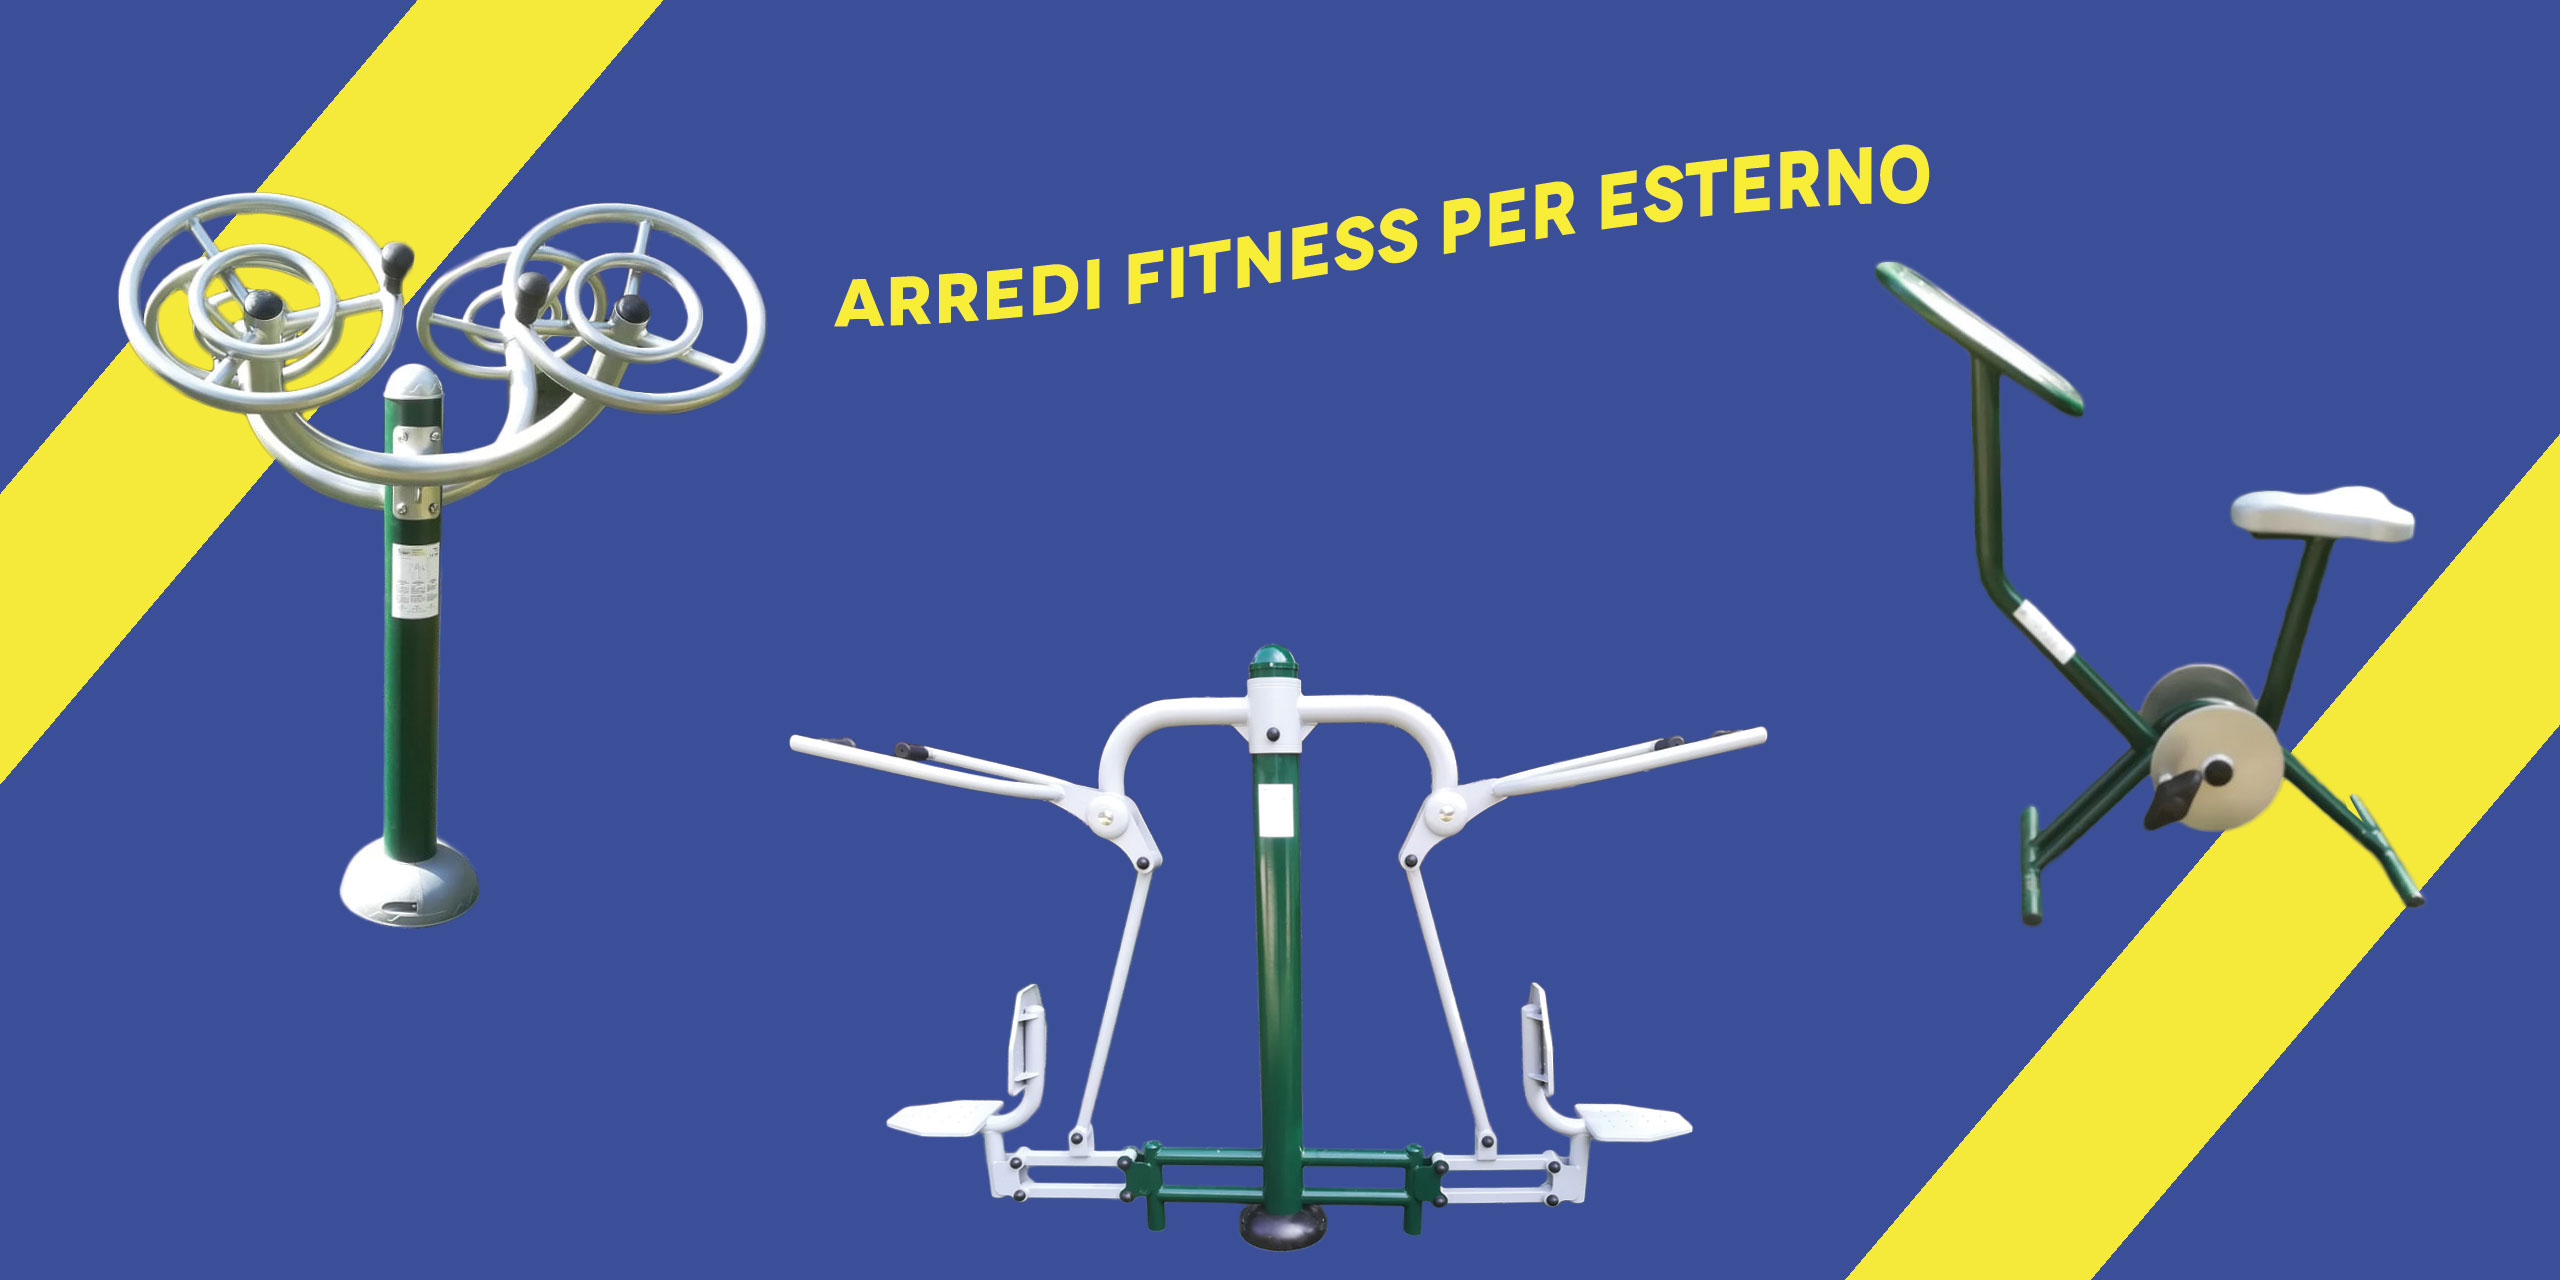 arredi-fitness-banner-copertina-home